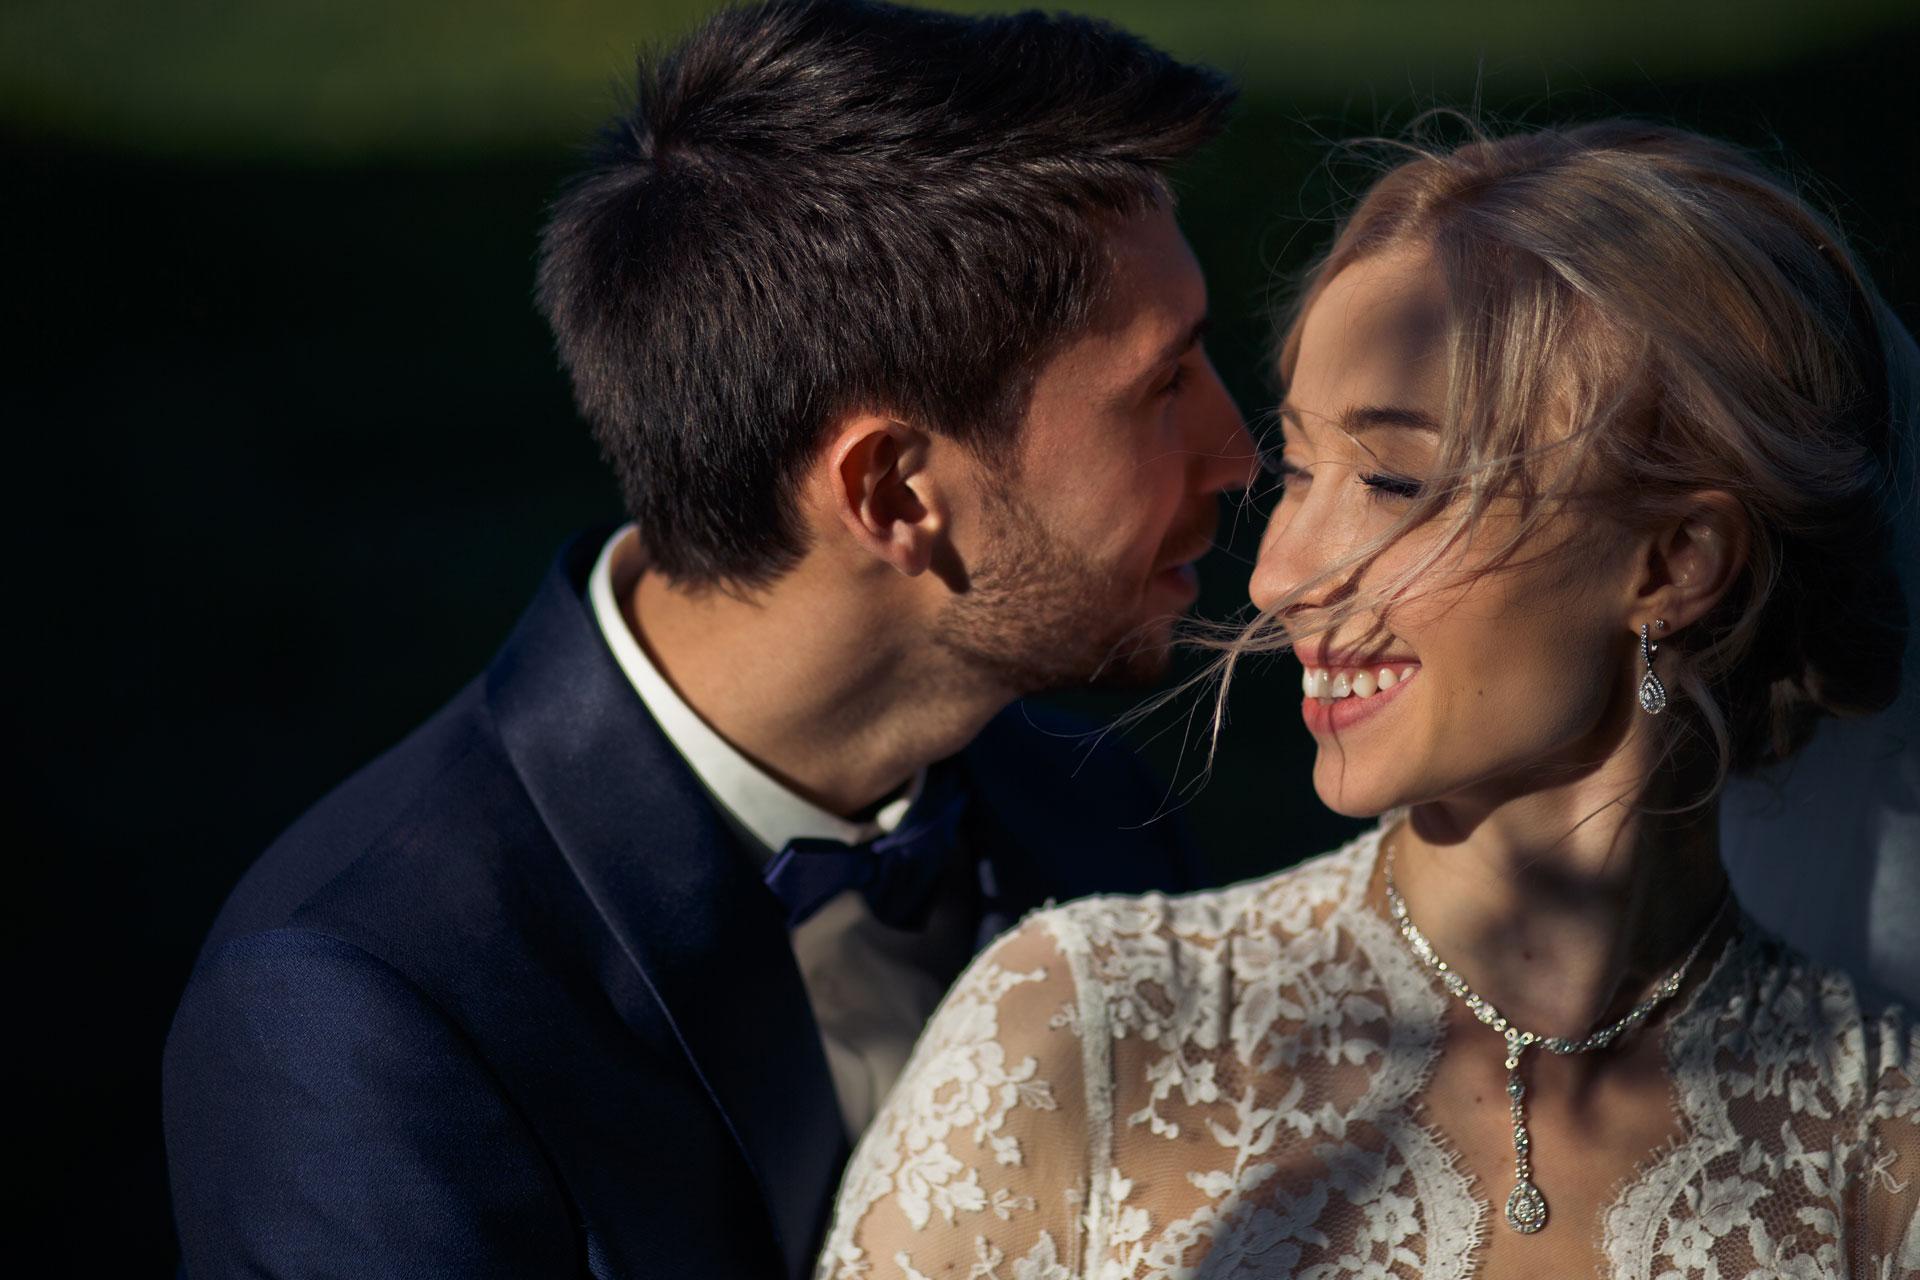 Вишневый сад. Свадьба Валентина Кротова и Натальи Ходуновой фото 13